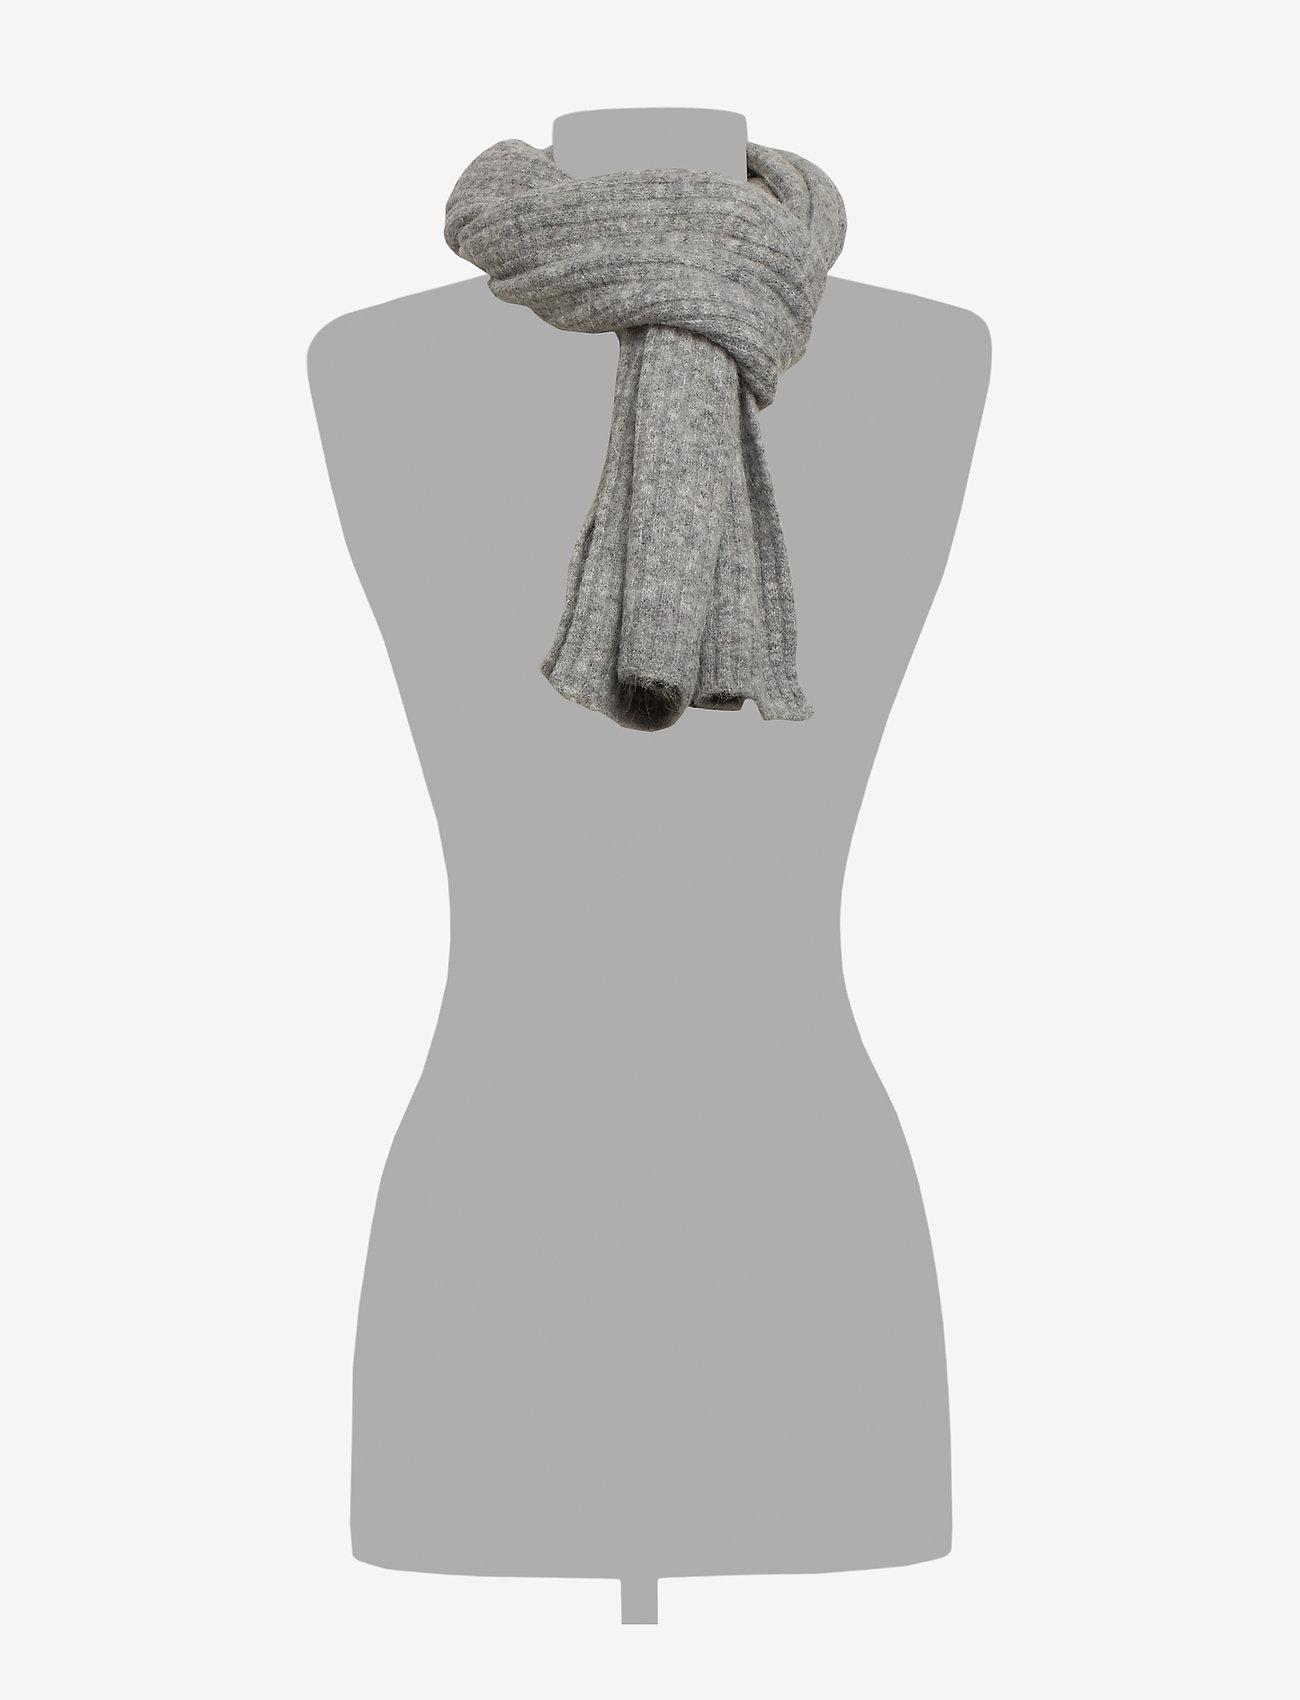 Samsøe Samsøe Nori scarf slim 7355 - Szaliki i chusty GREY MEL. - Akcesoria